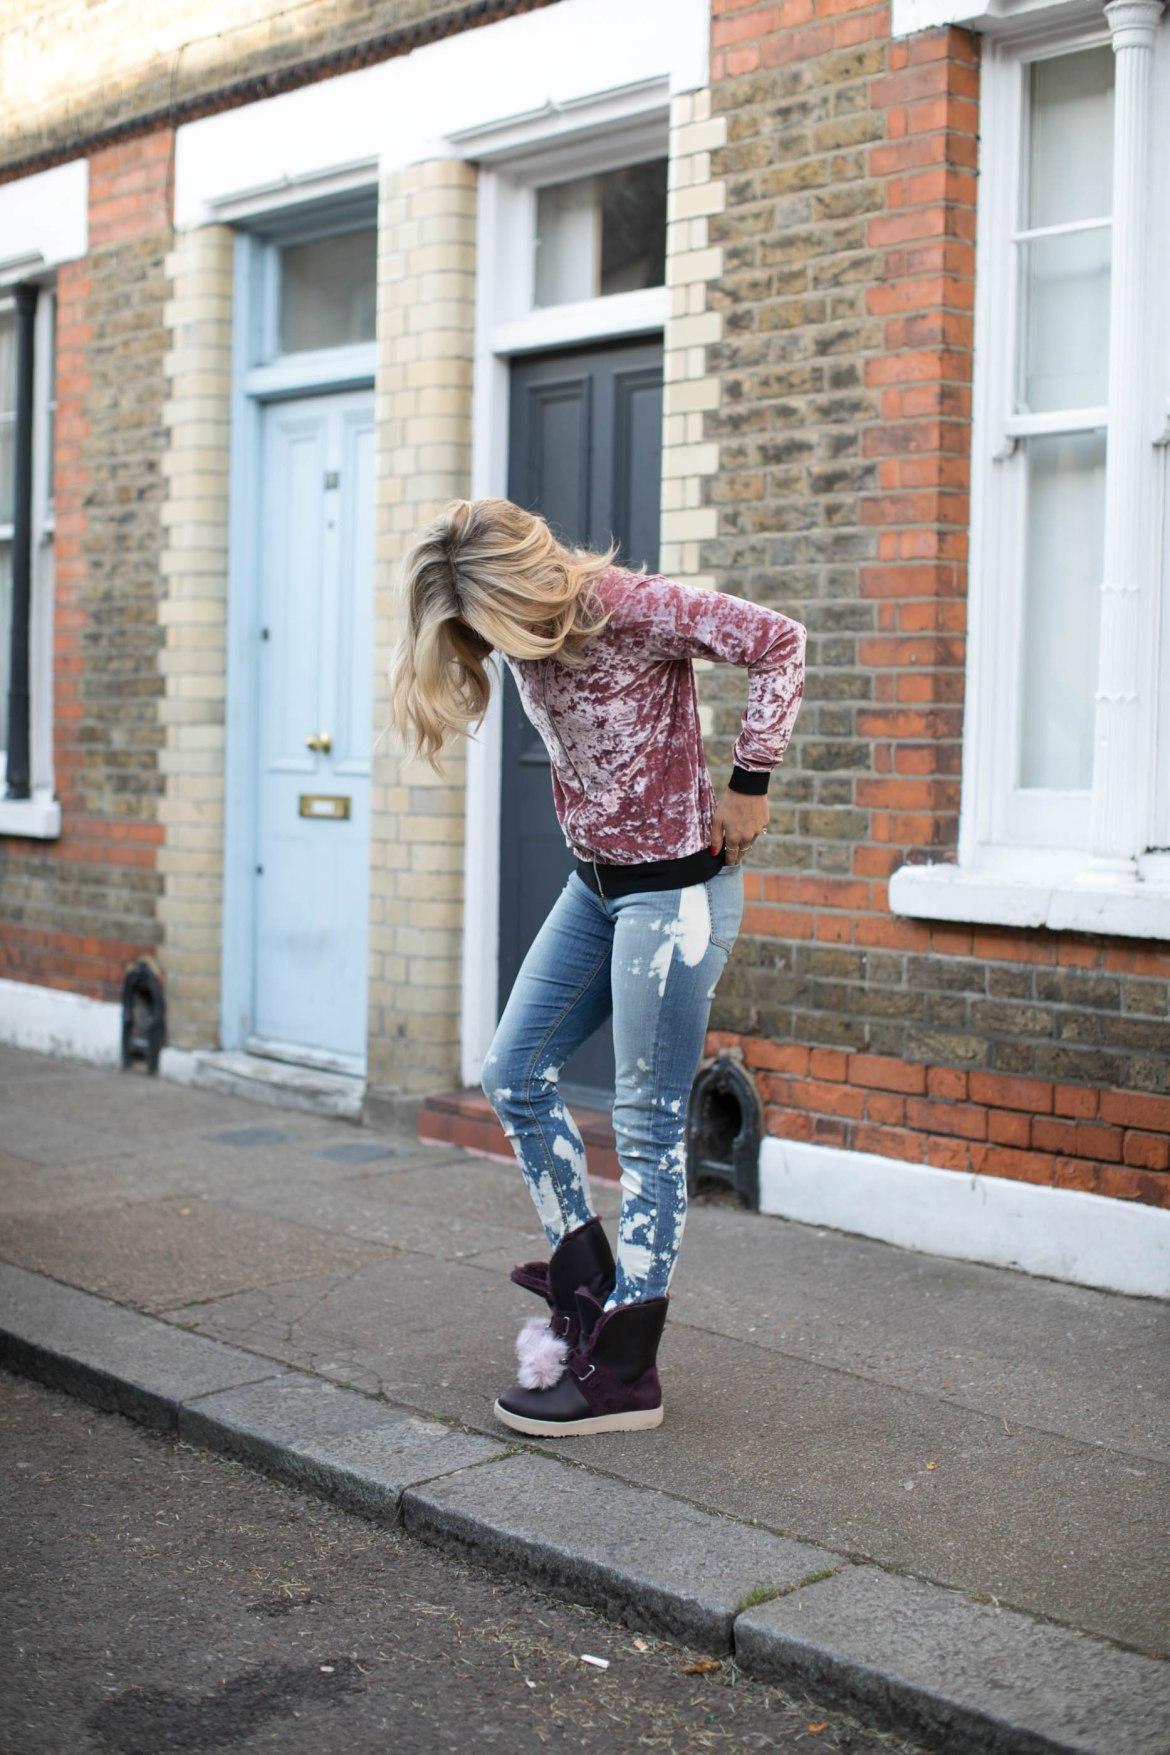 olivia cox, tv presenter, model, influencer, ugg, sheepskin boots, sheepskin, fblogger, street style, inspo, blogger